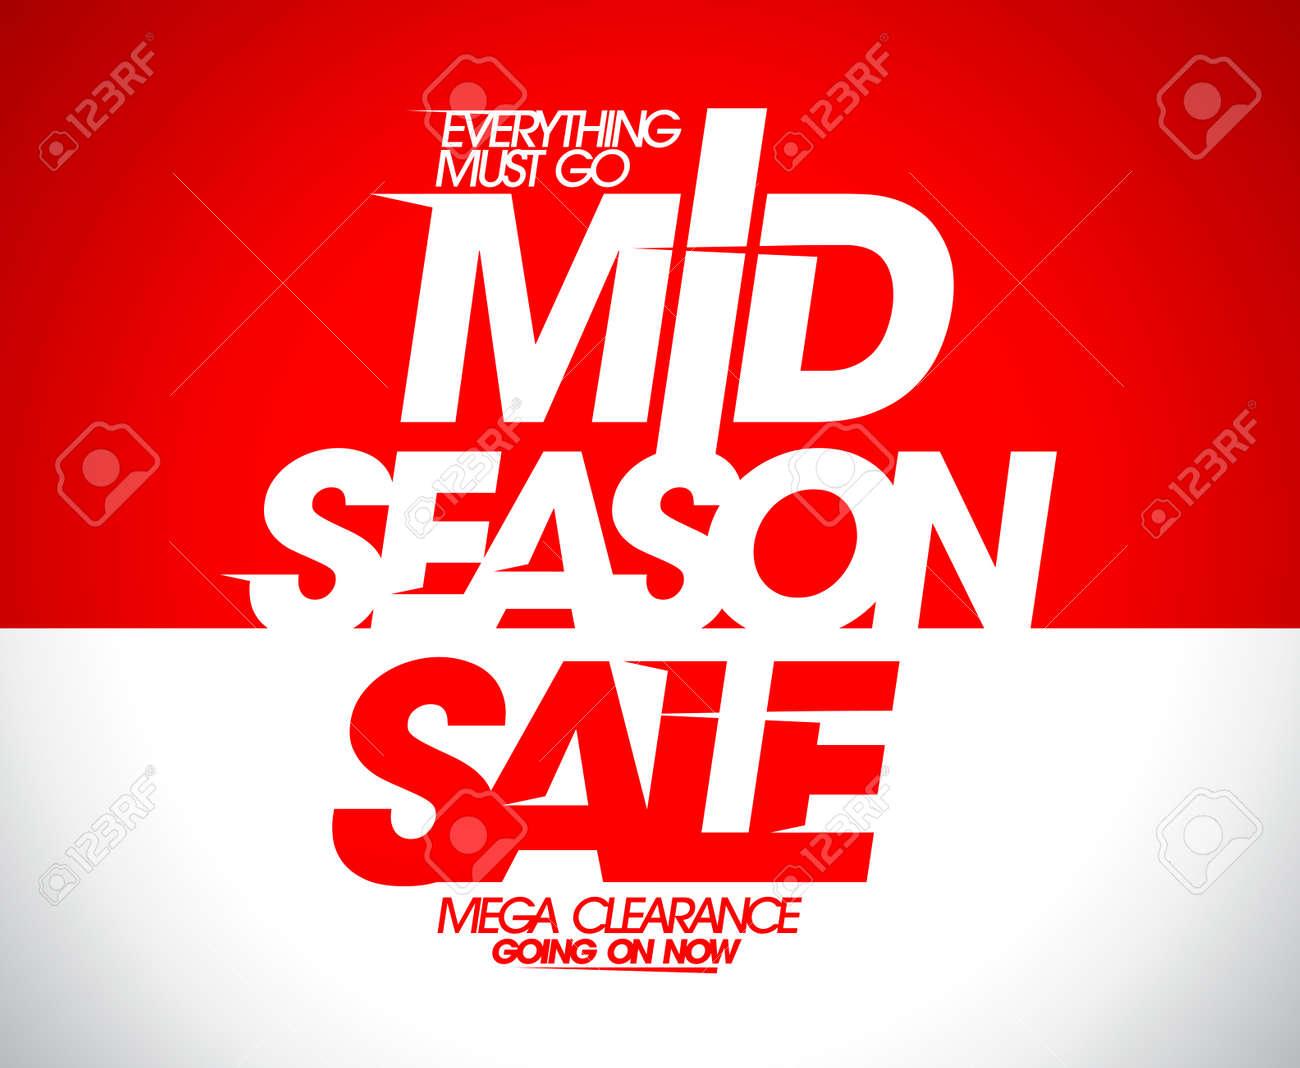 c9c829c61765e Mega clearance going on, mid season sale banner. Stock Vector - 55088530